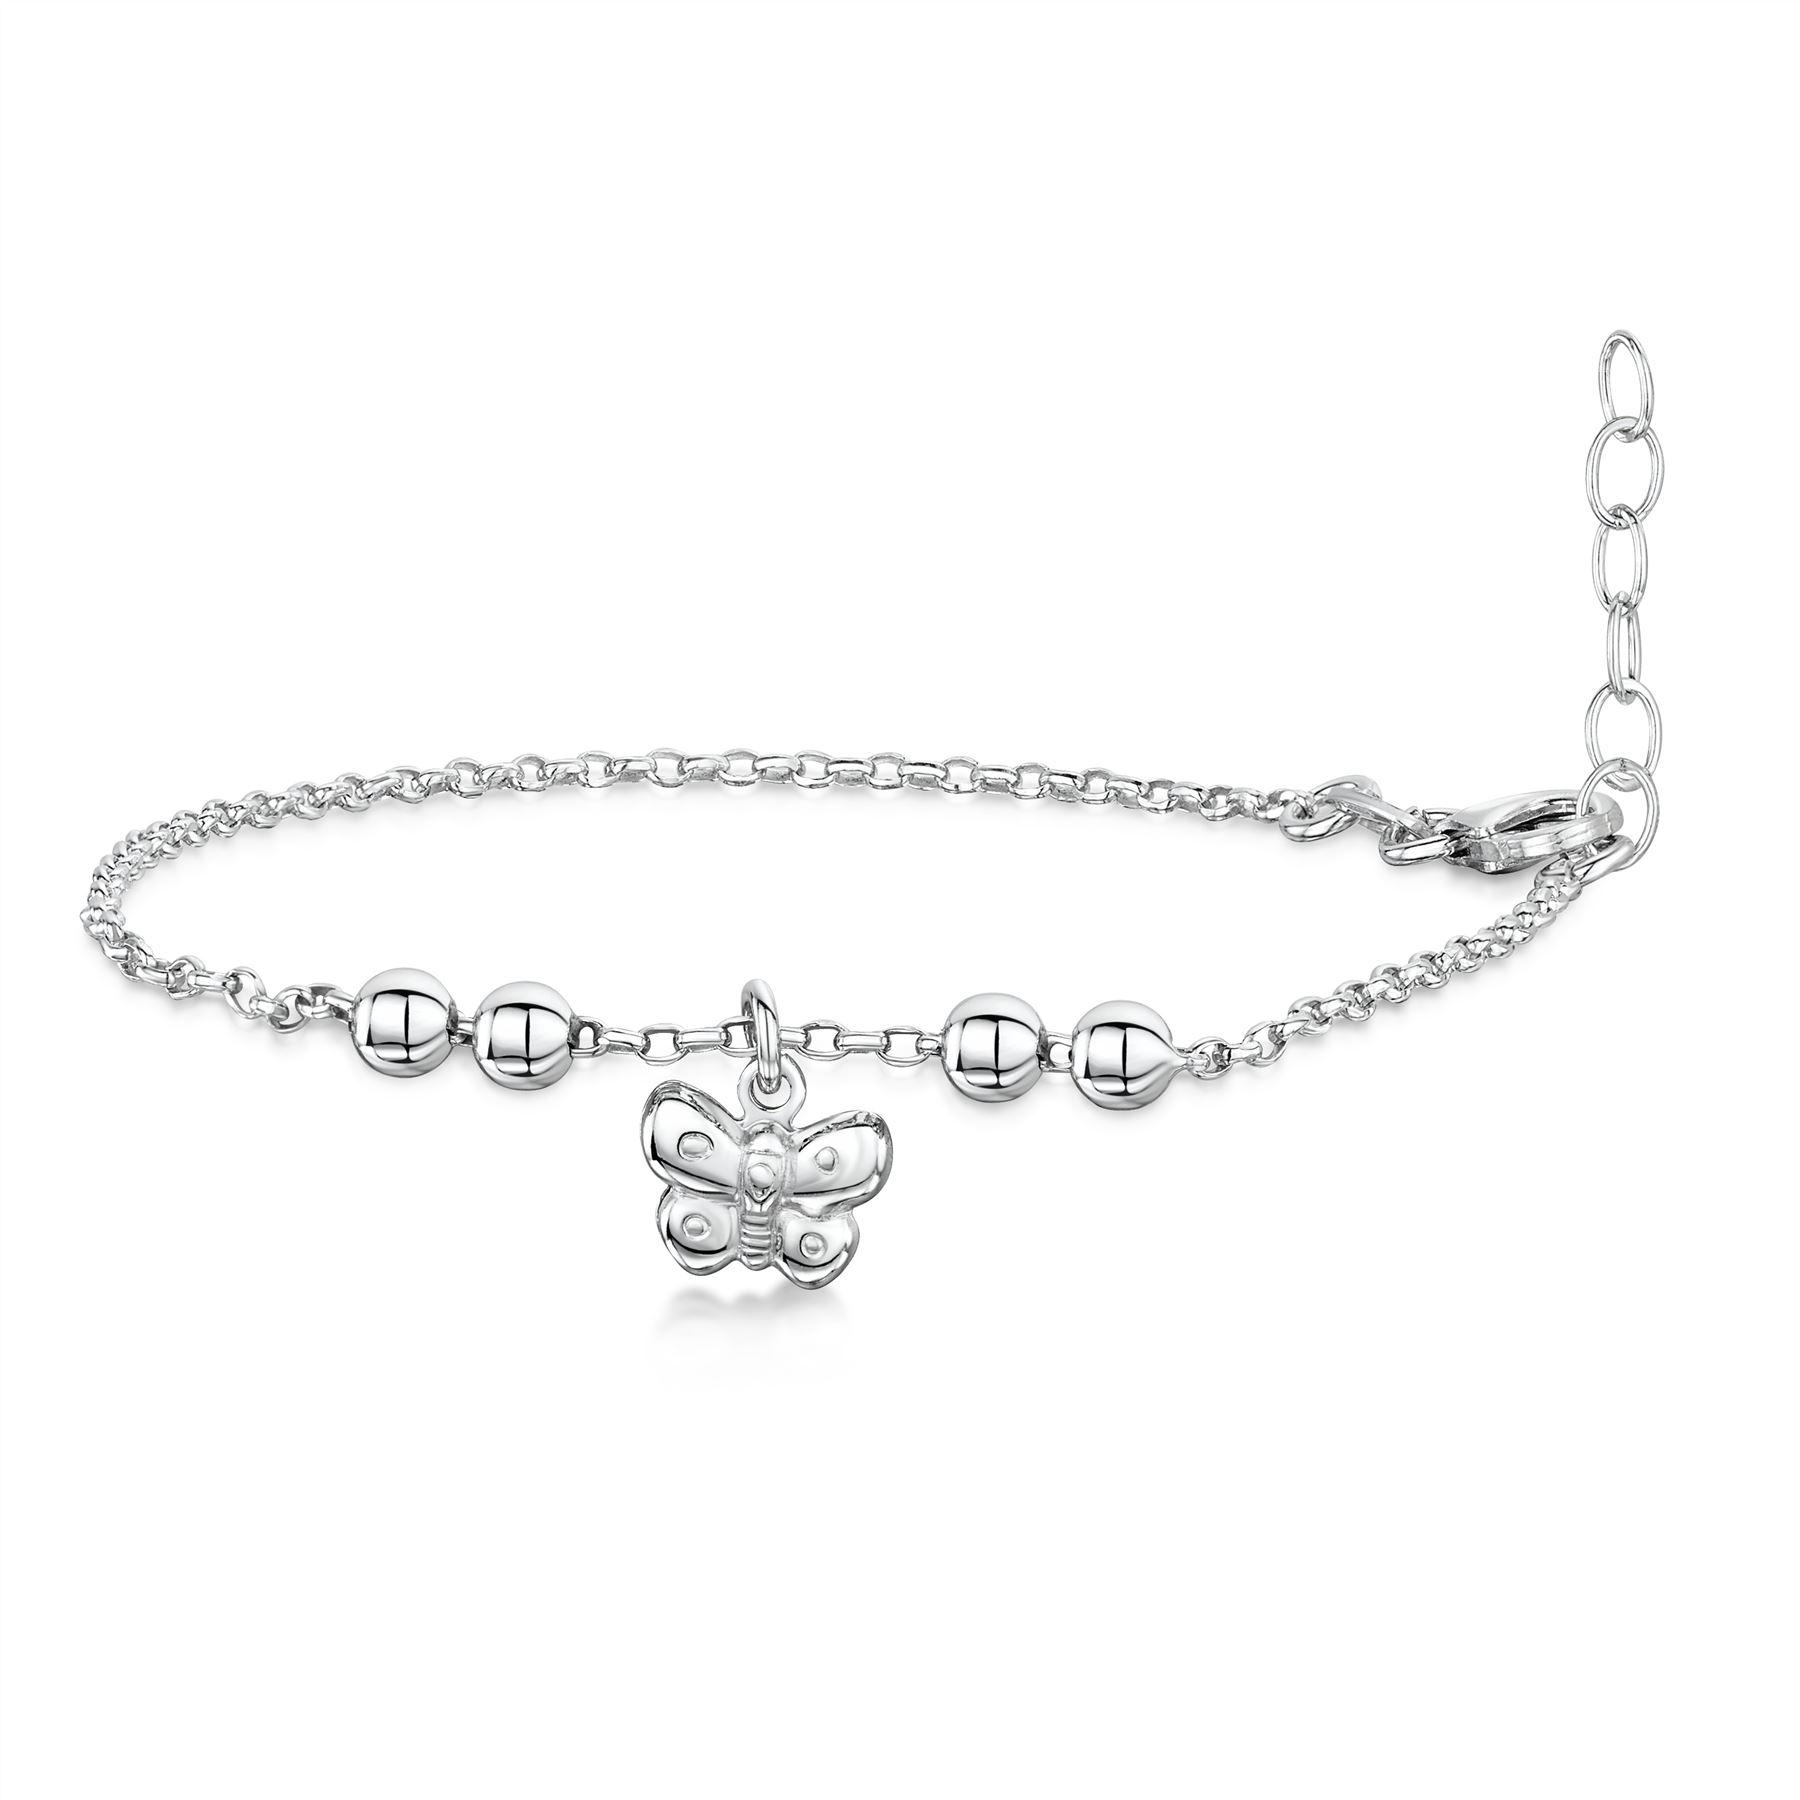 Amberta-Jewelry-925-Sterling-Silver-Adjustable-Bracelet-Italian-Bangle-for-Women thumbnail 42